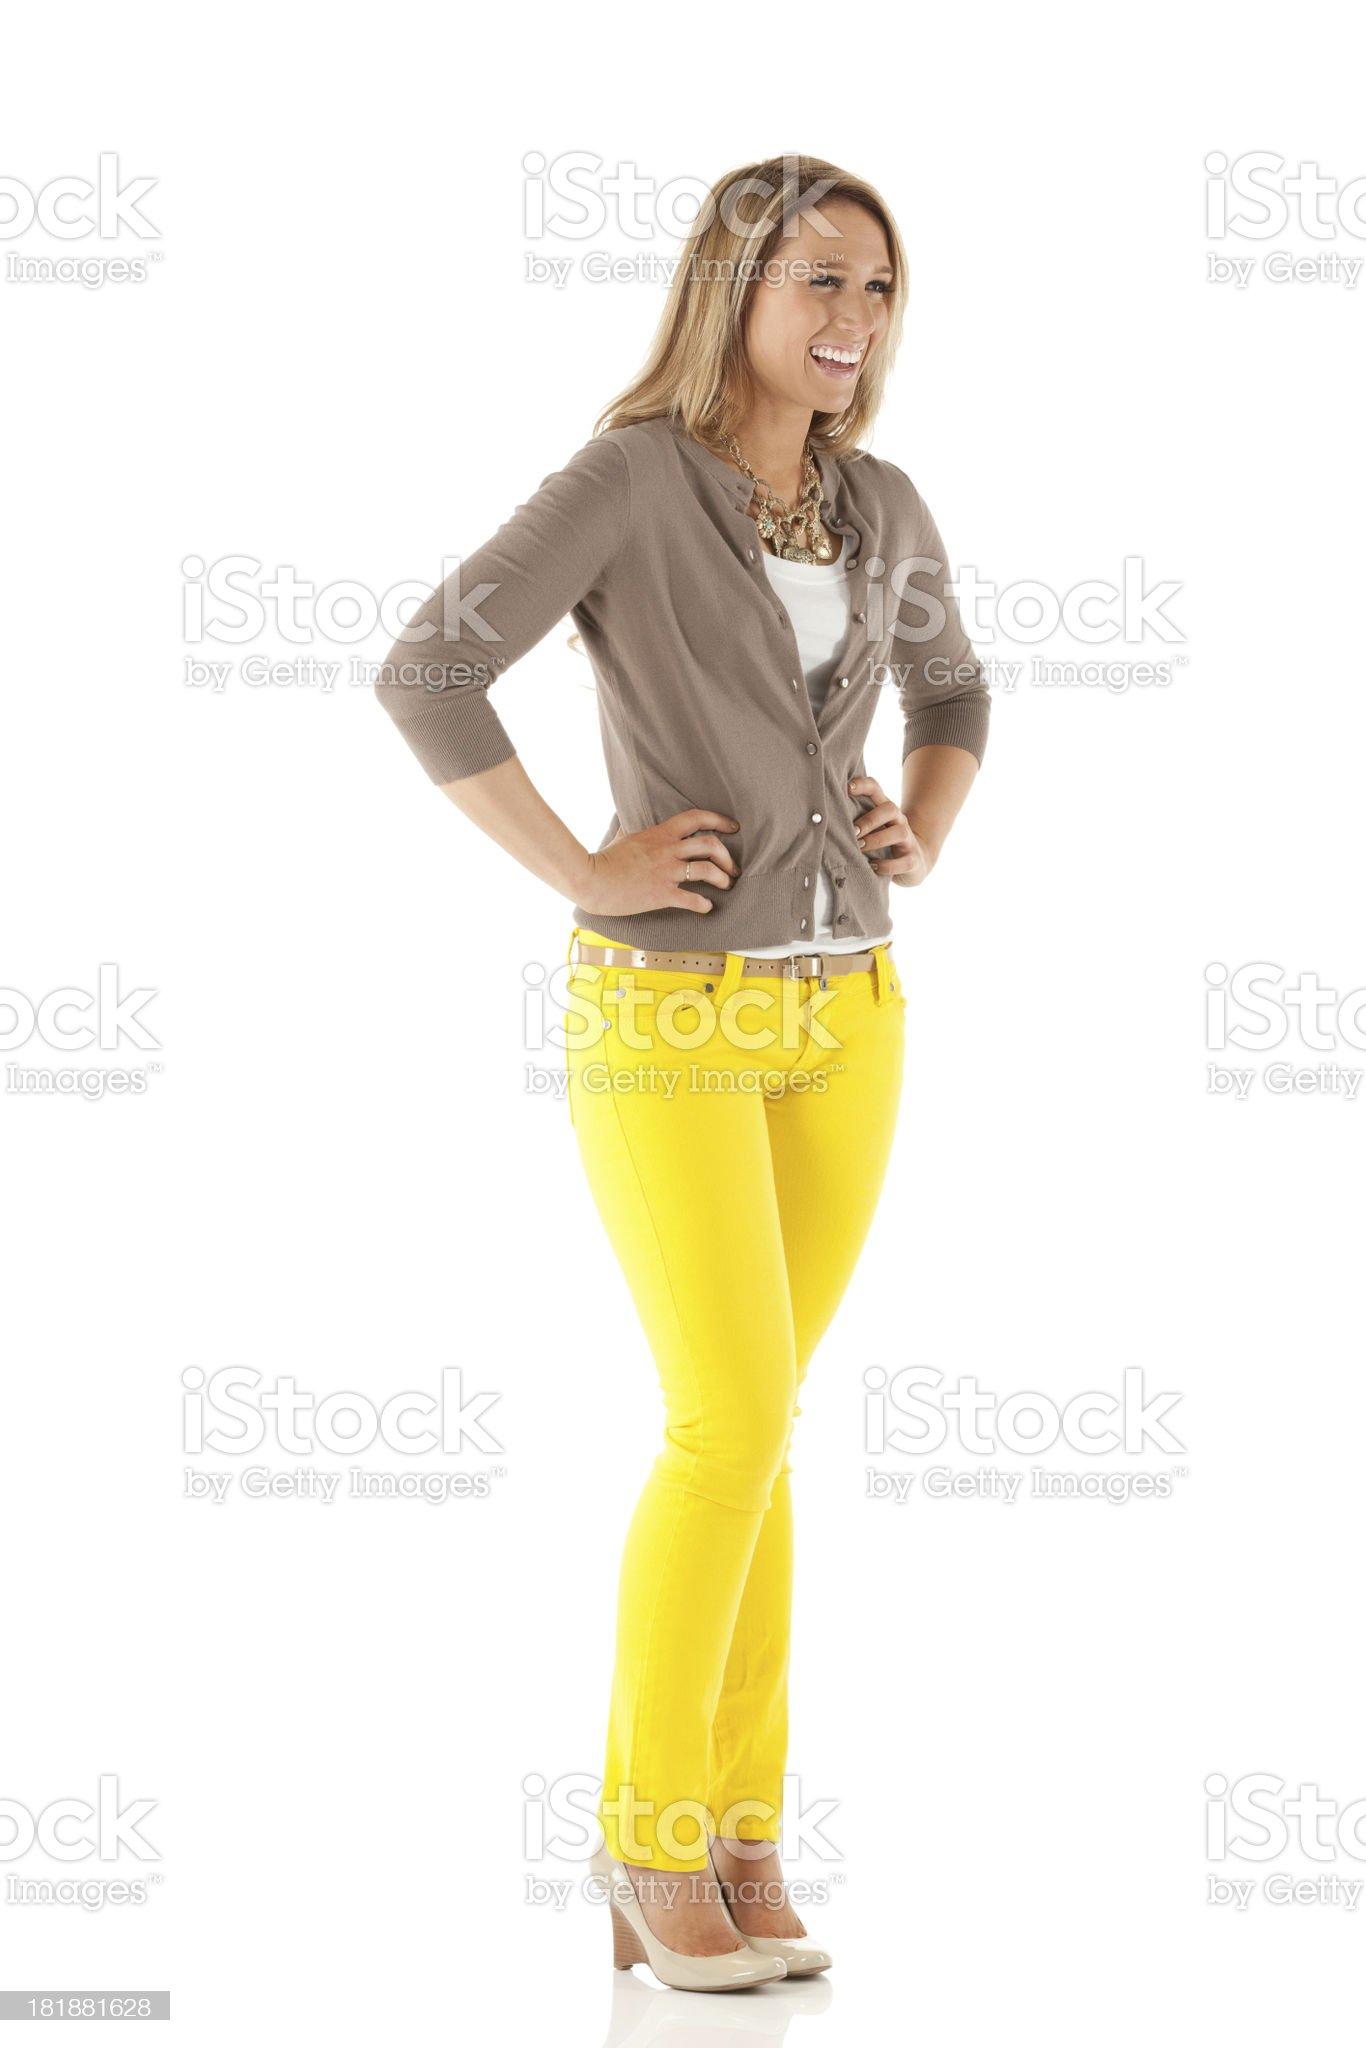 Woman smling royalty-free stock photo